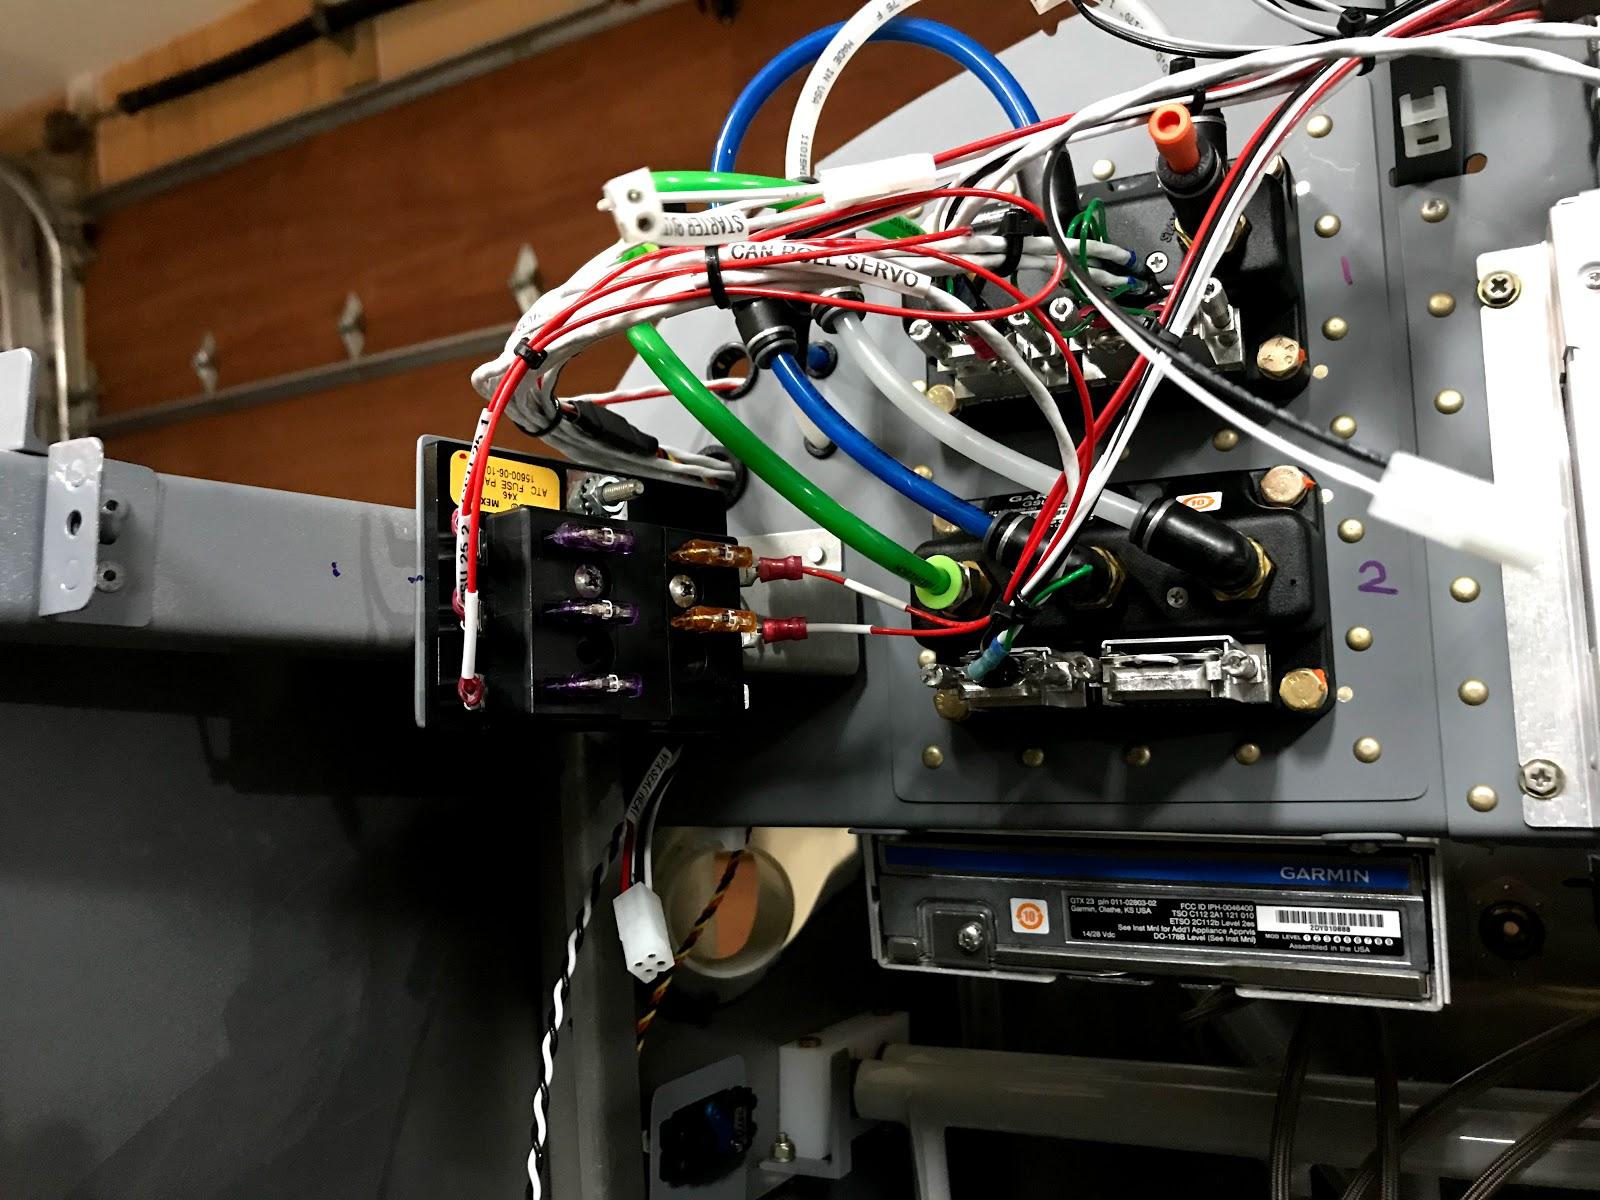 all avionics wiring in place  [ 1600 x 1200 Pixel ]